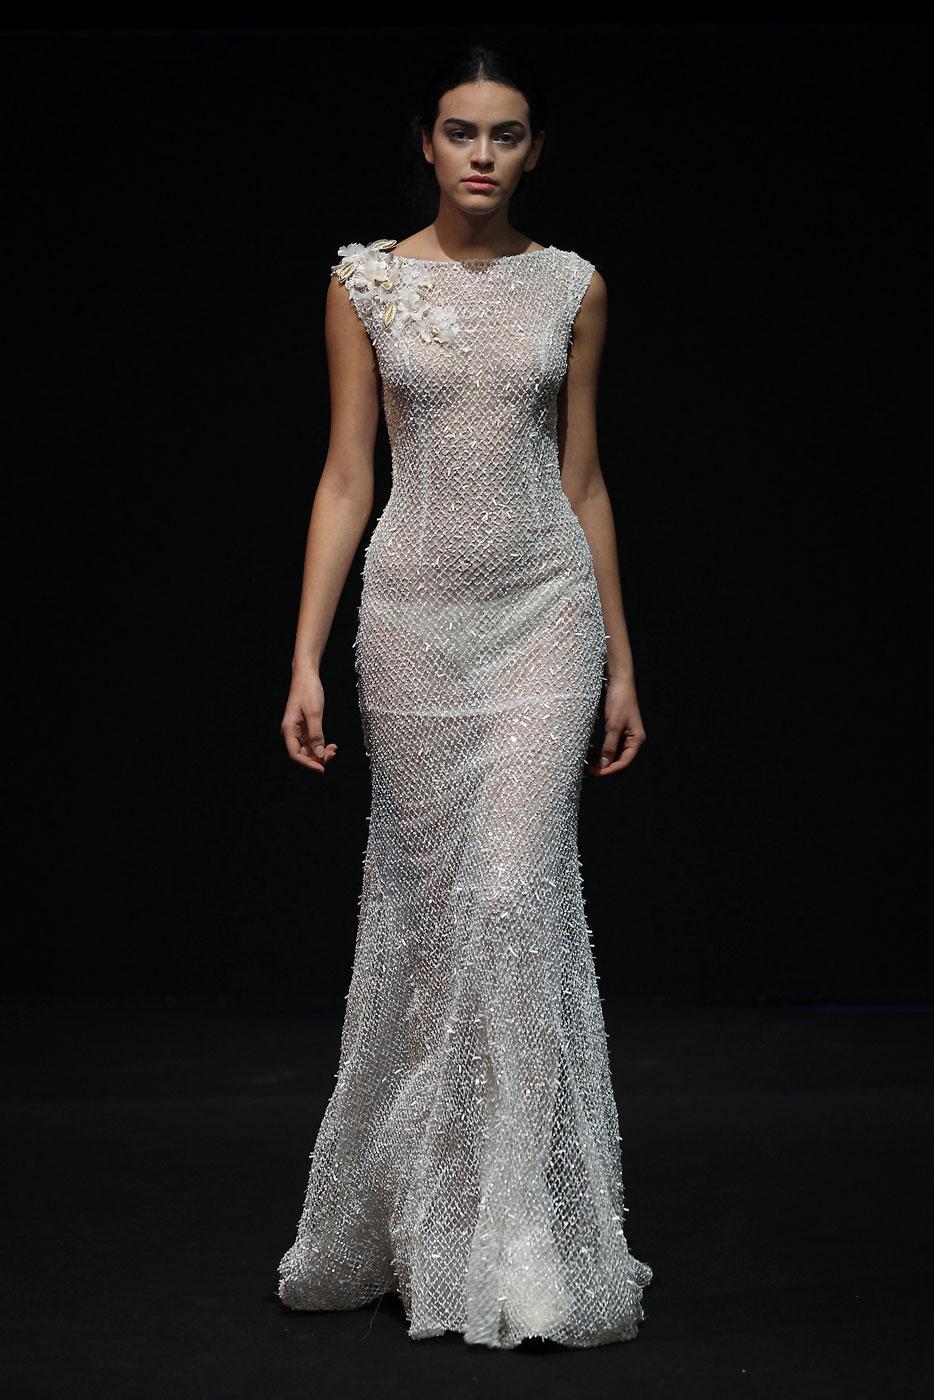 Abed-Mahfouz-fashion-runway-show-haute-couture-paris-spring-2015-the-impression-01